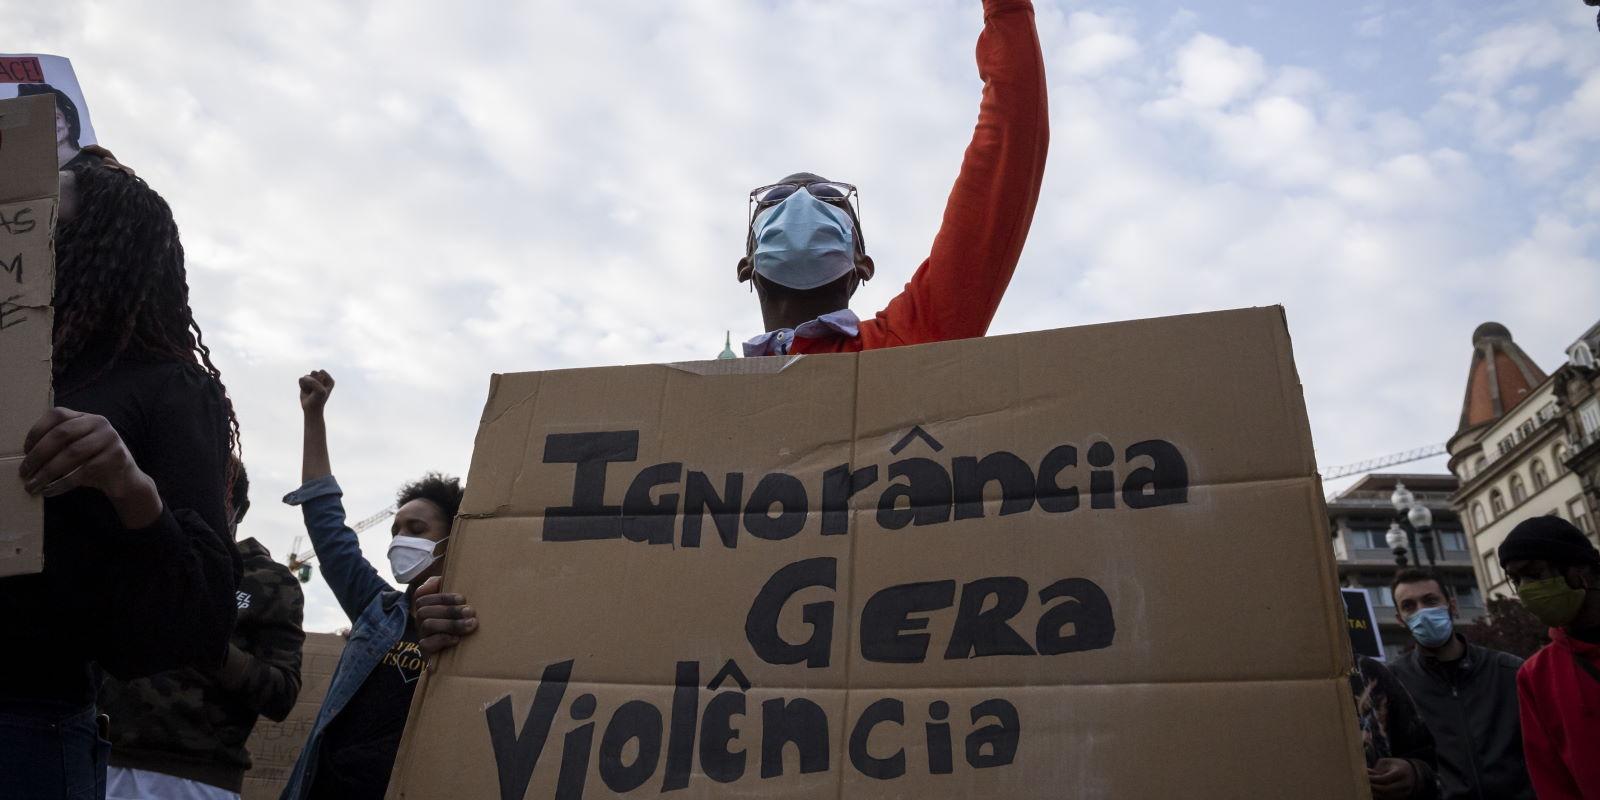 Photo: Rita Franca/NurPhoto